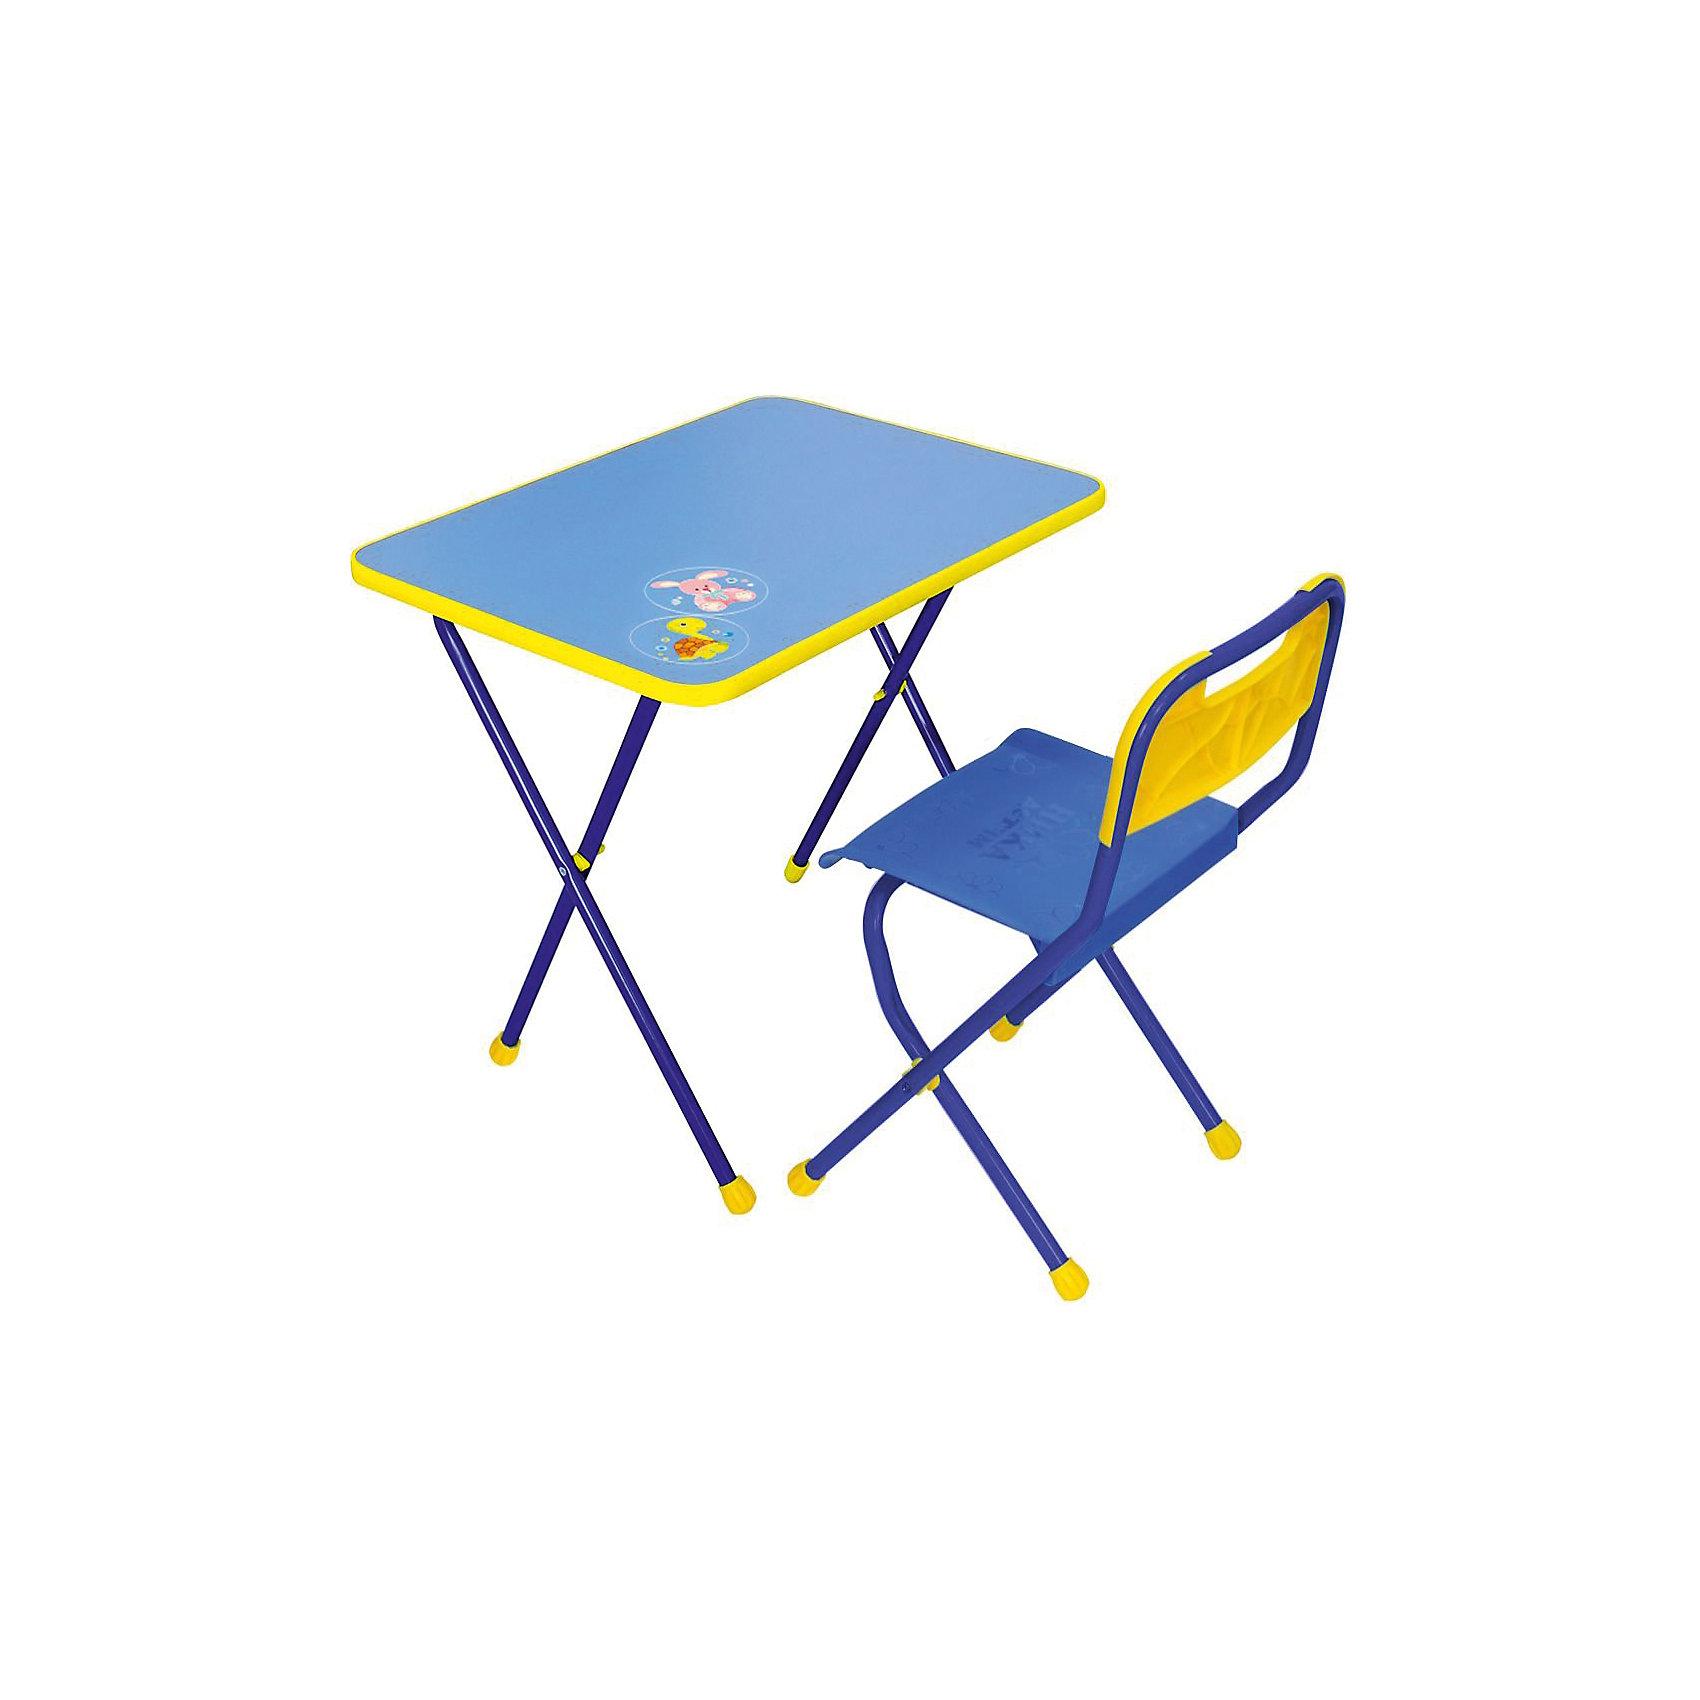 Набор мебели КА1, Алина, Ника, синий  купить тумбочку с шухлядами от производителя